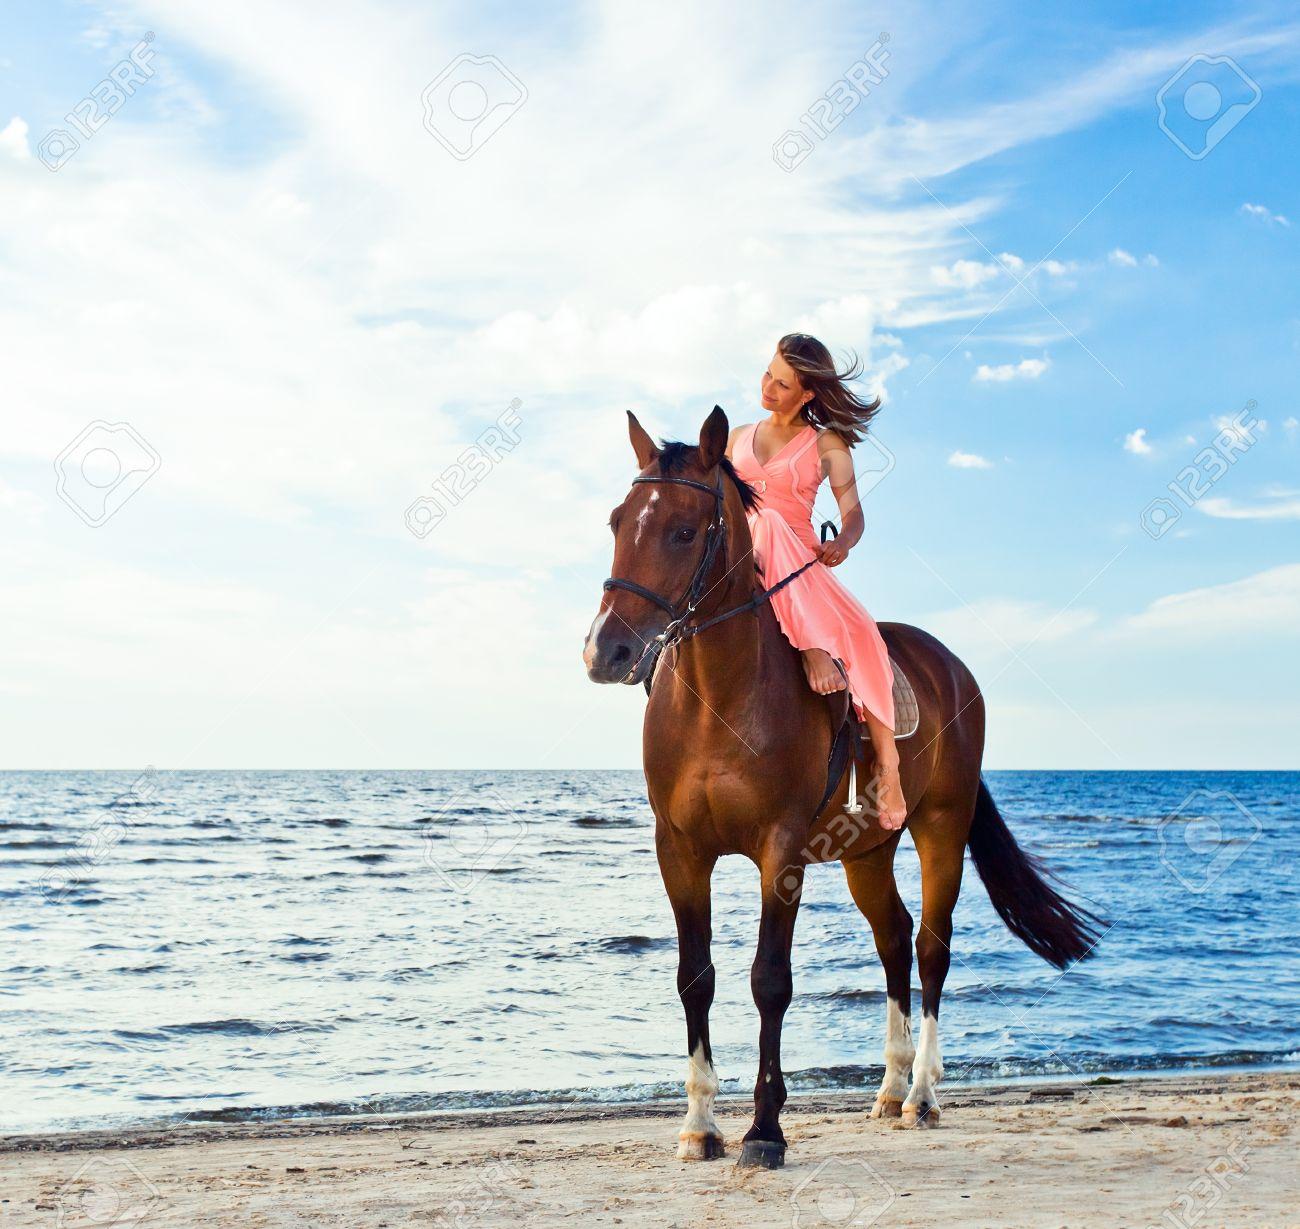 Фото в платьях на лошадях 89